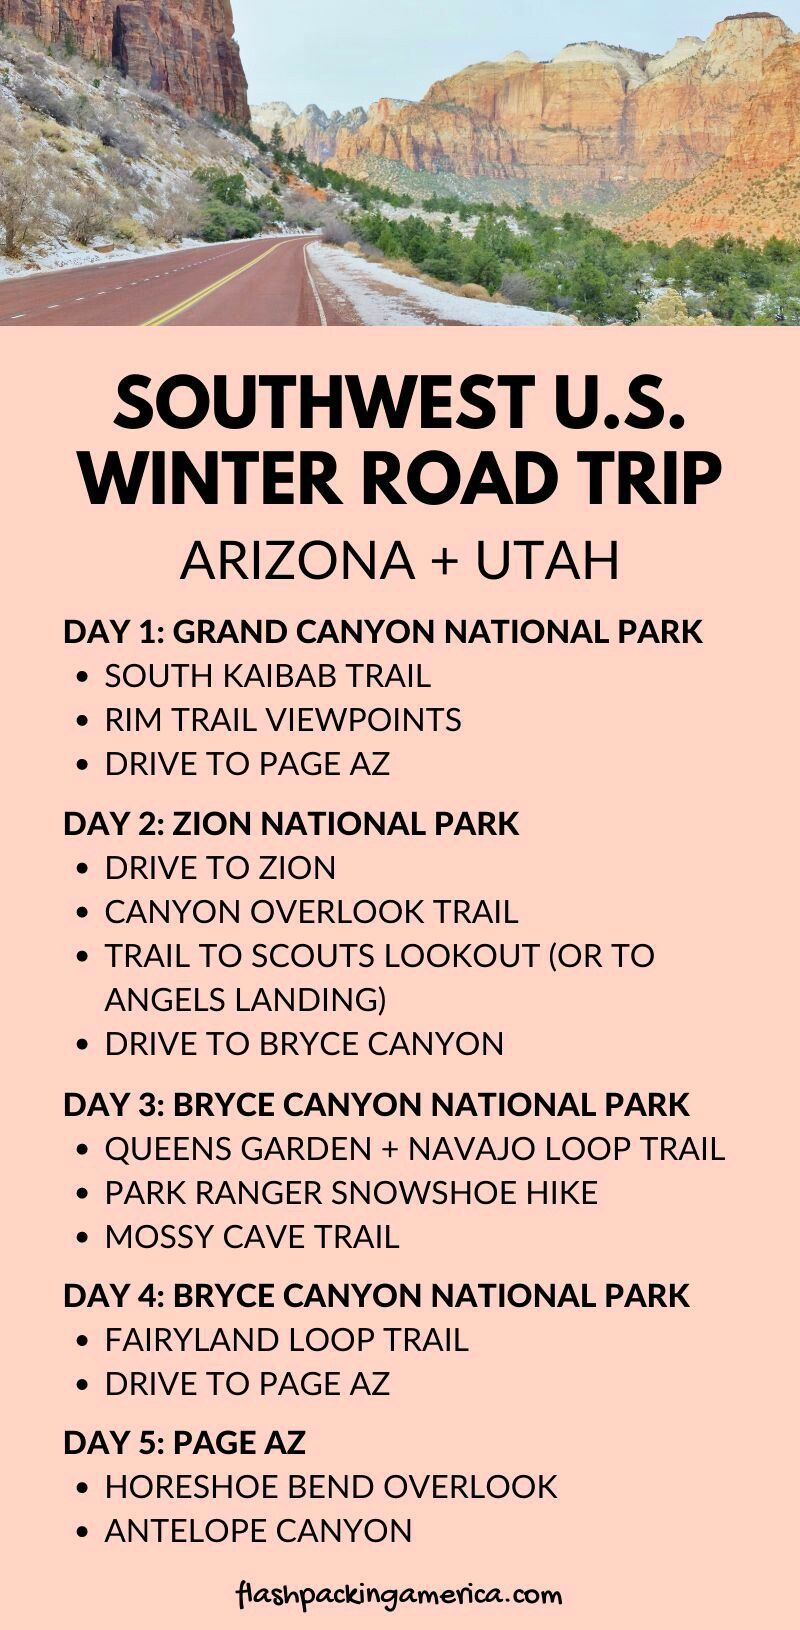 Arizona Utah national parks 5 day winter itinerary: U.S. Road trip from Phoenix